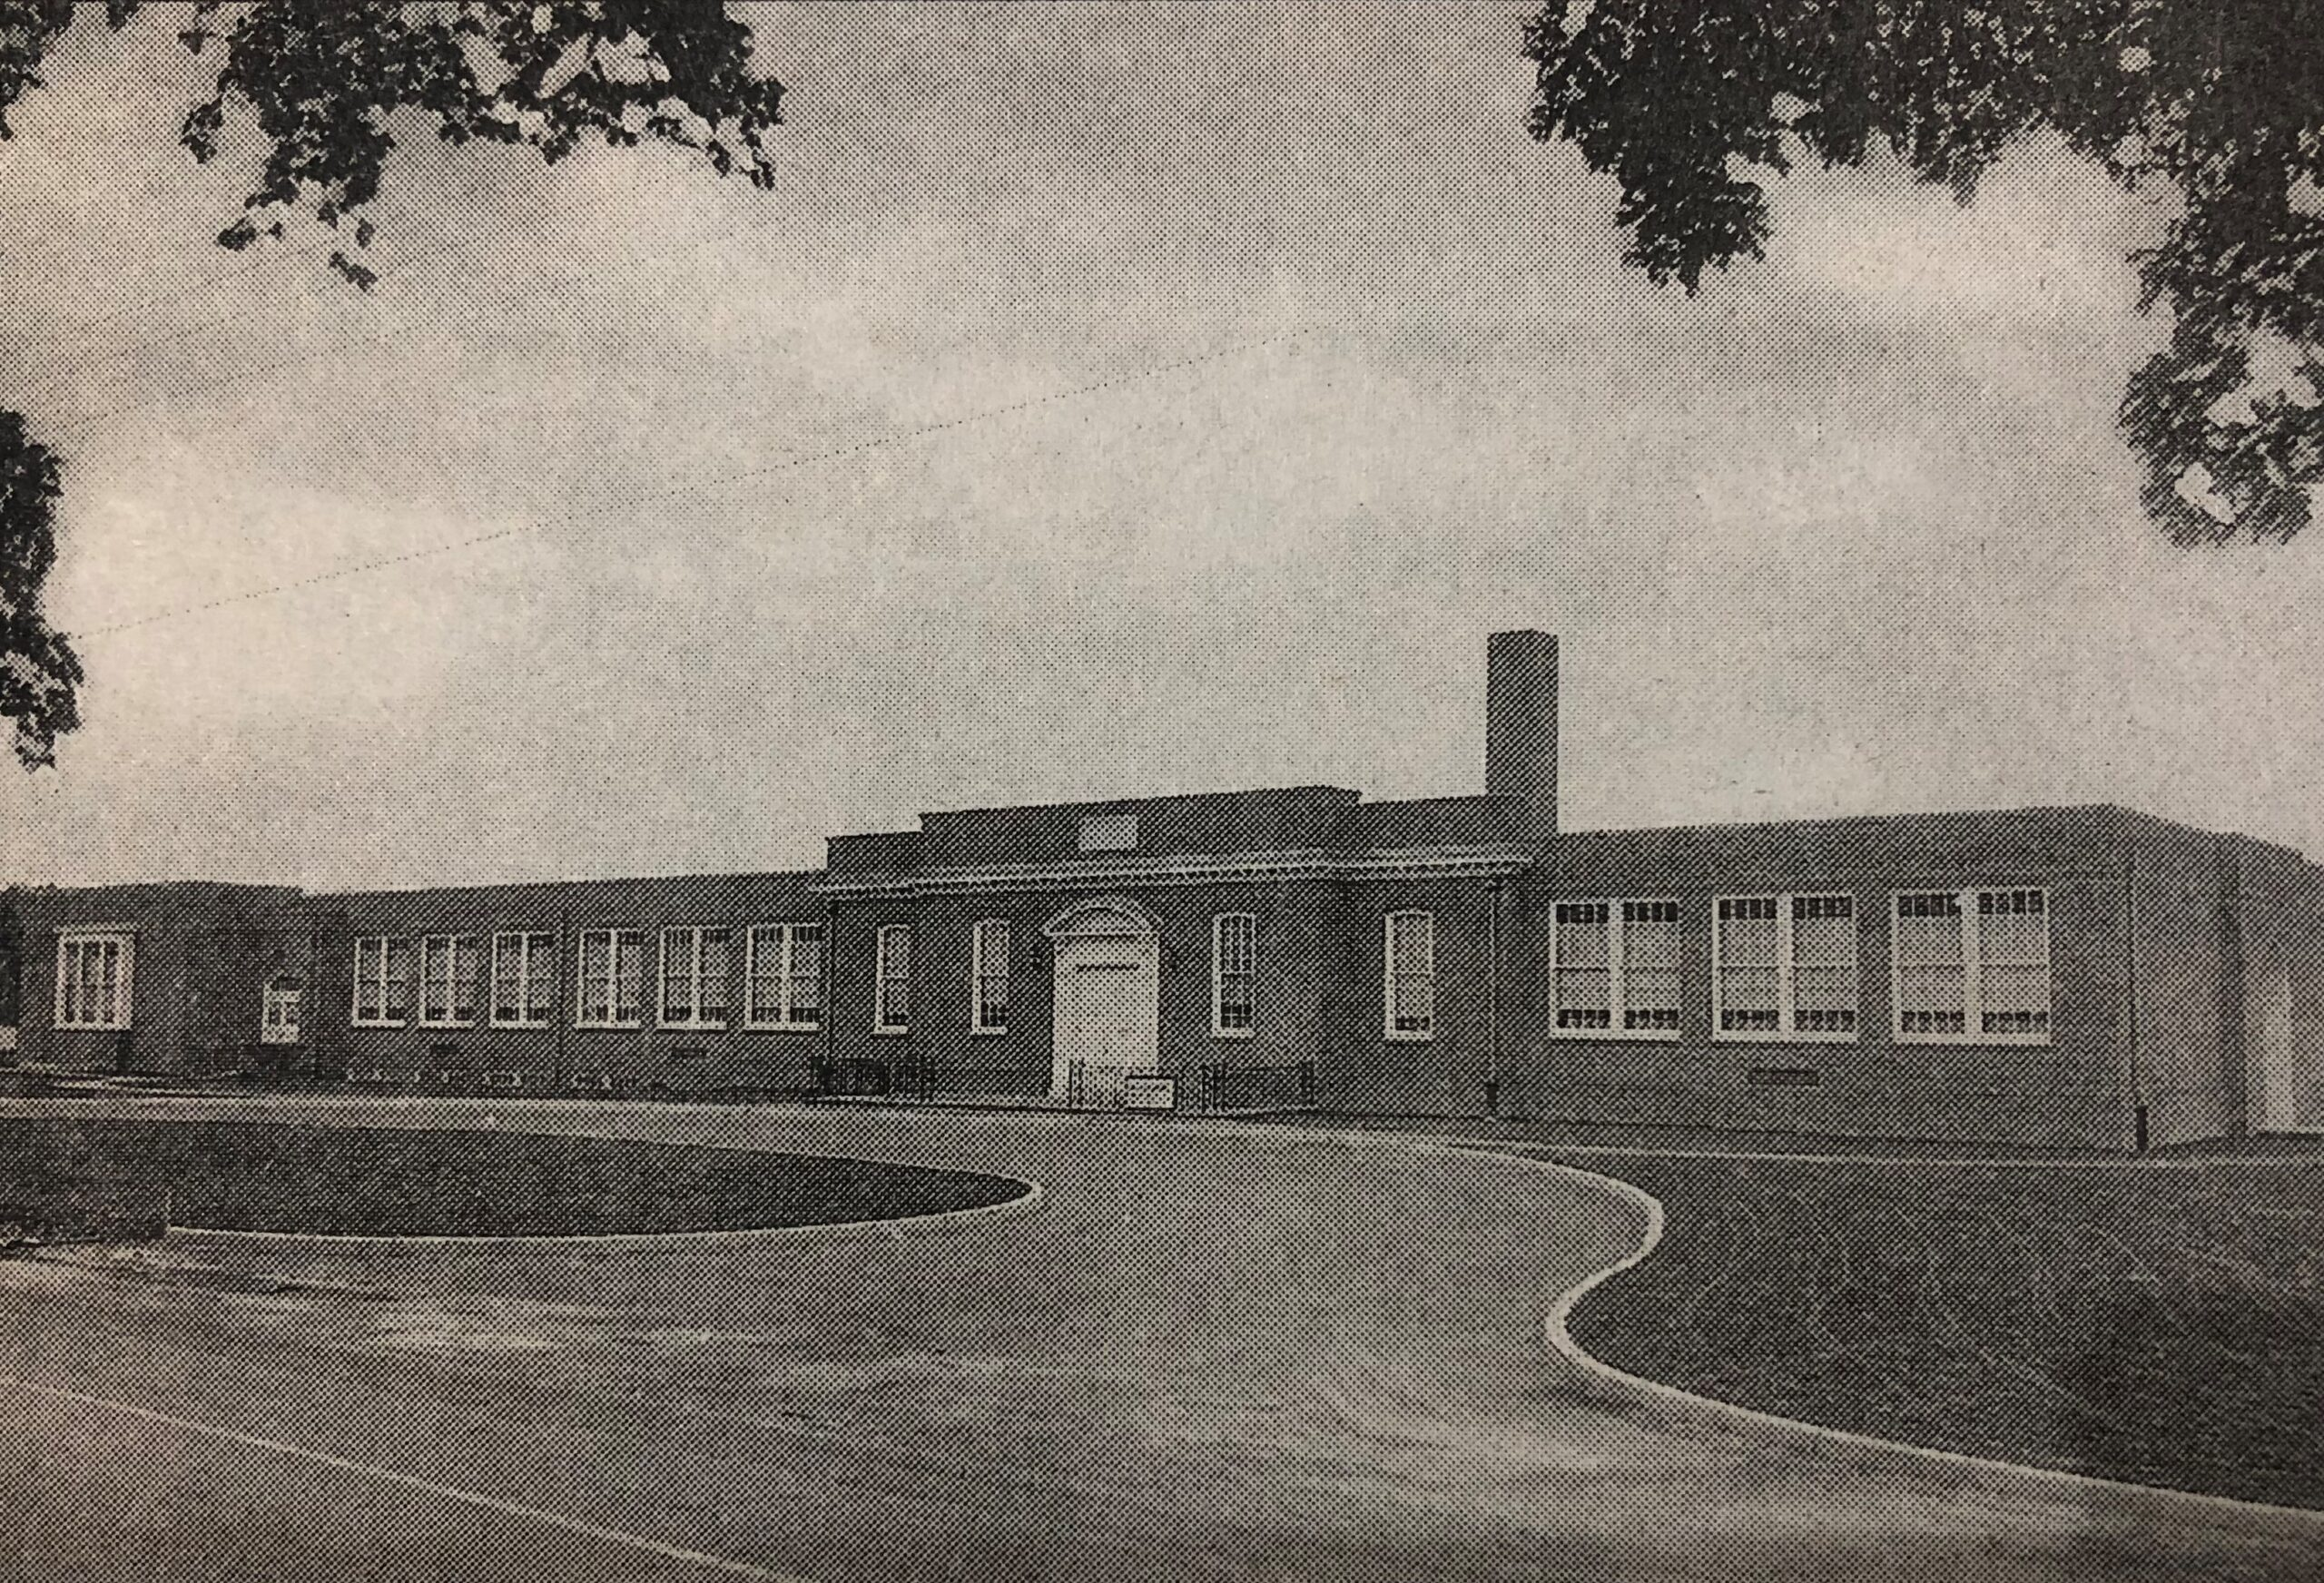 Enfield Elementary 1948